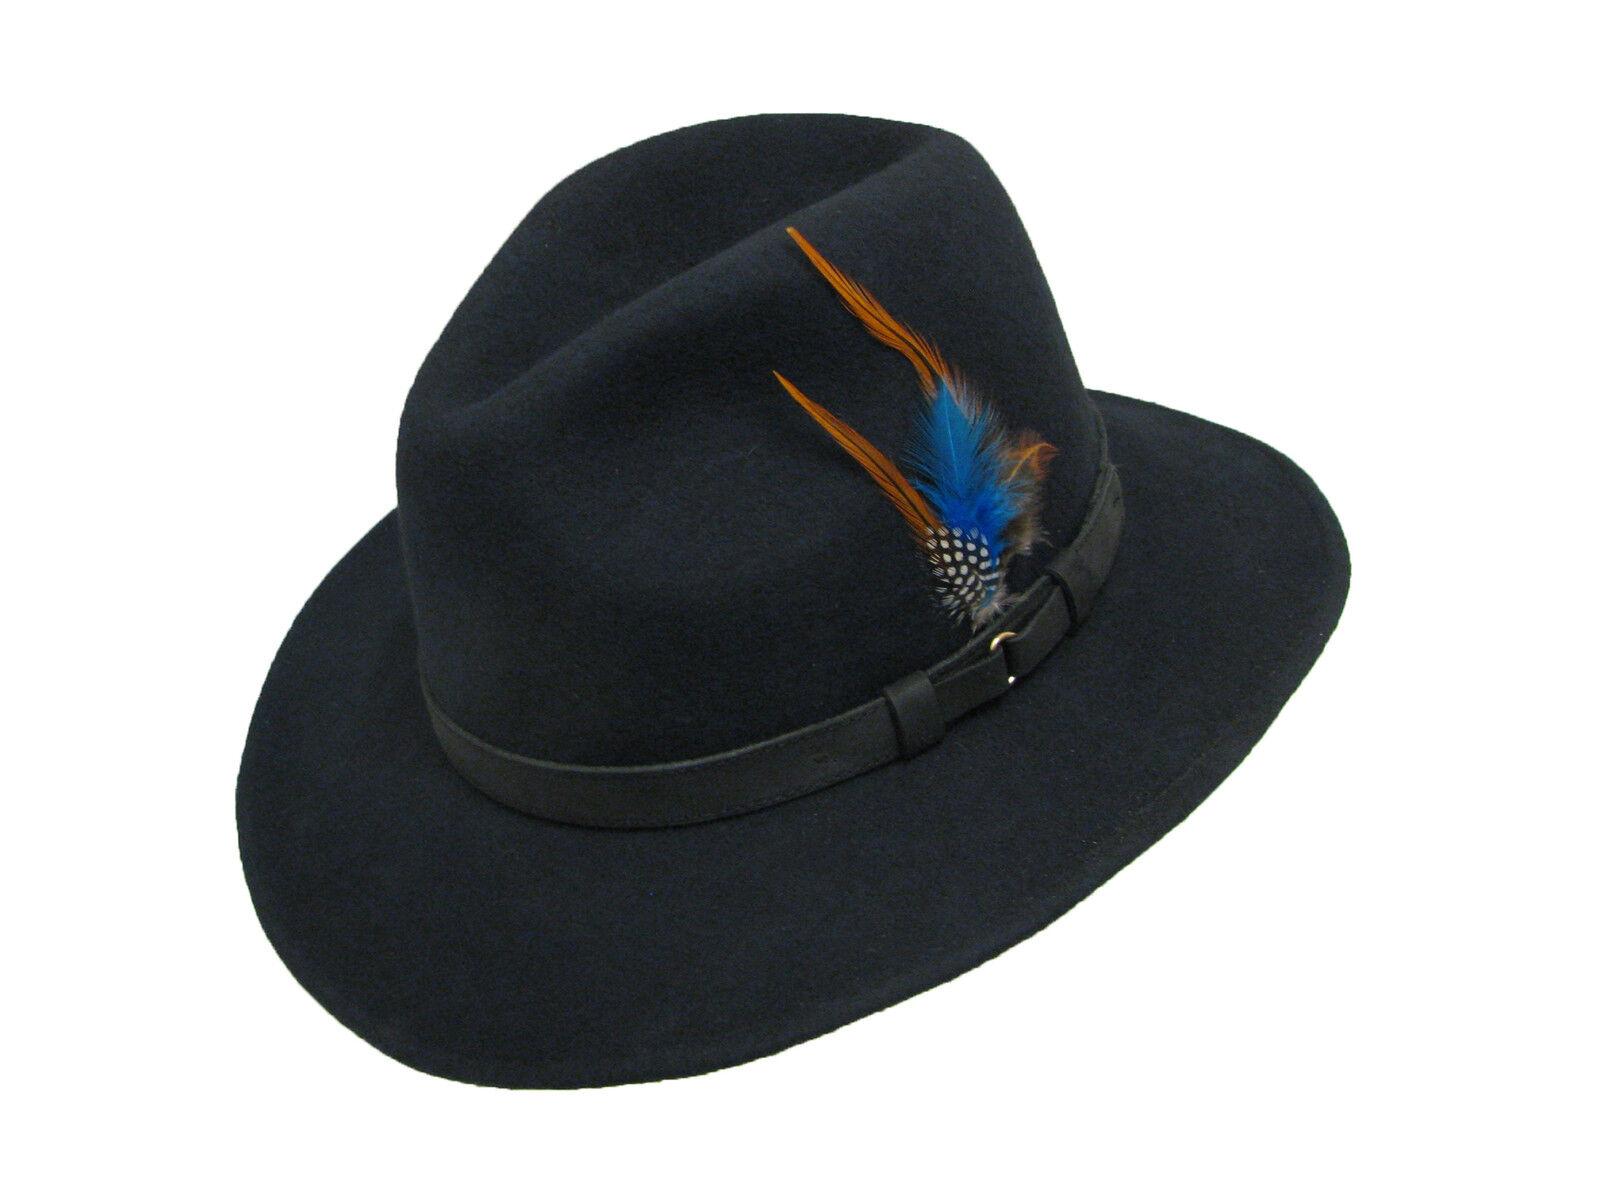 Foldable Wide Brim Felt Bowler Fedora Hat Style: Casual